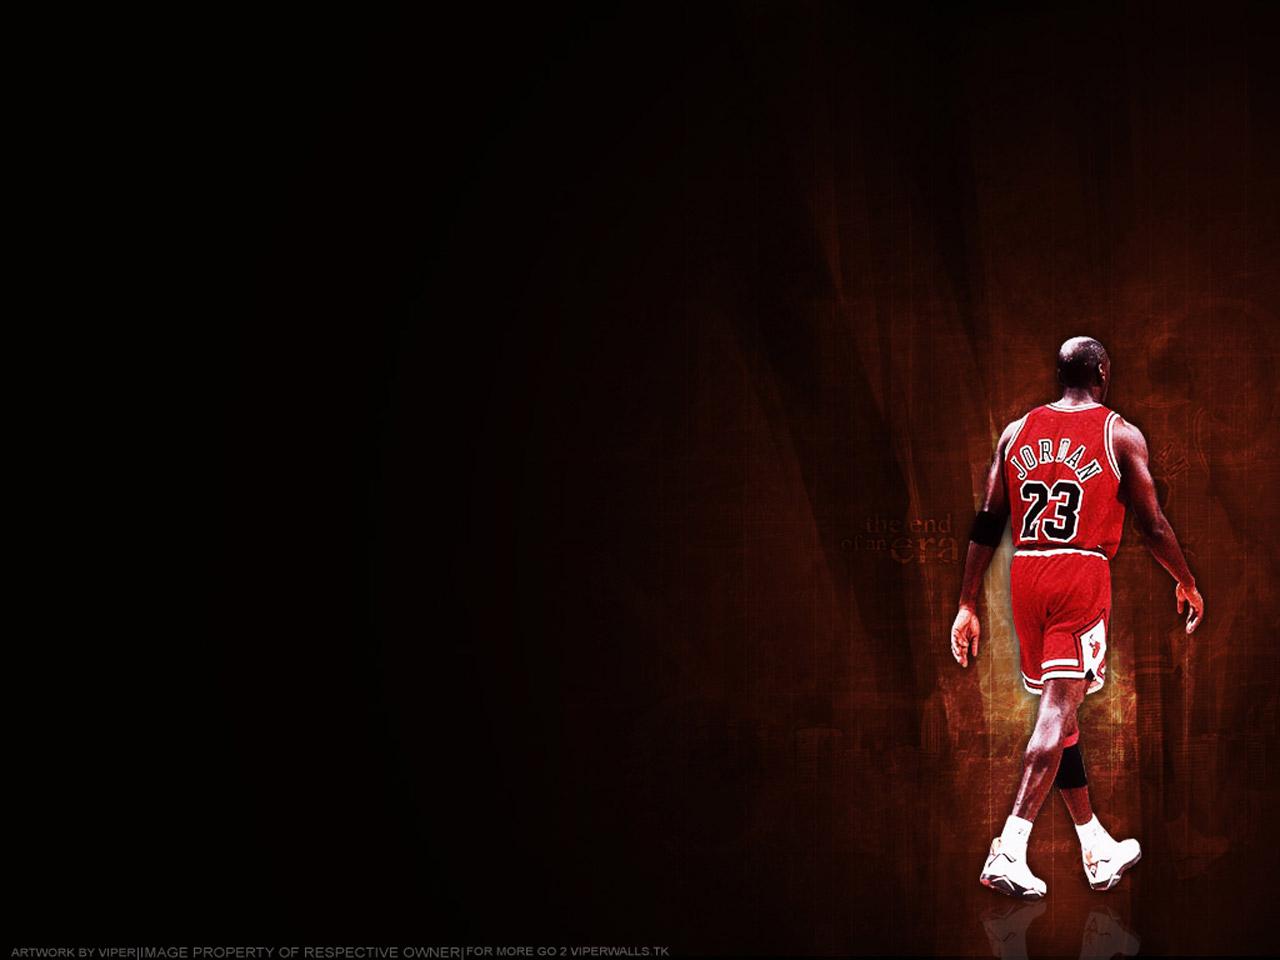 Michael Jordan Jersey Wallpaper Re Re 1280x960